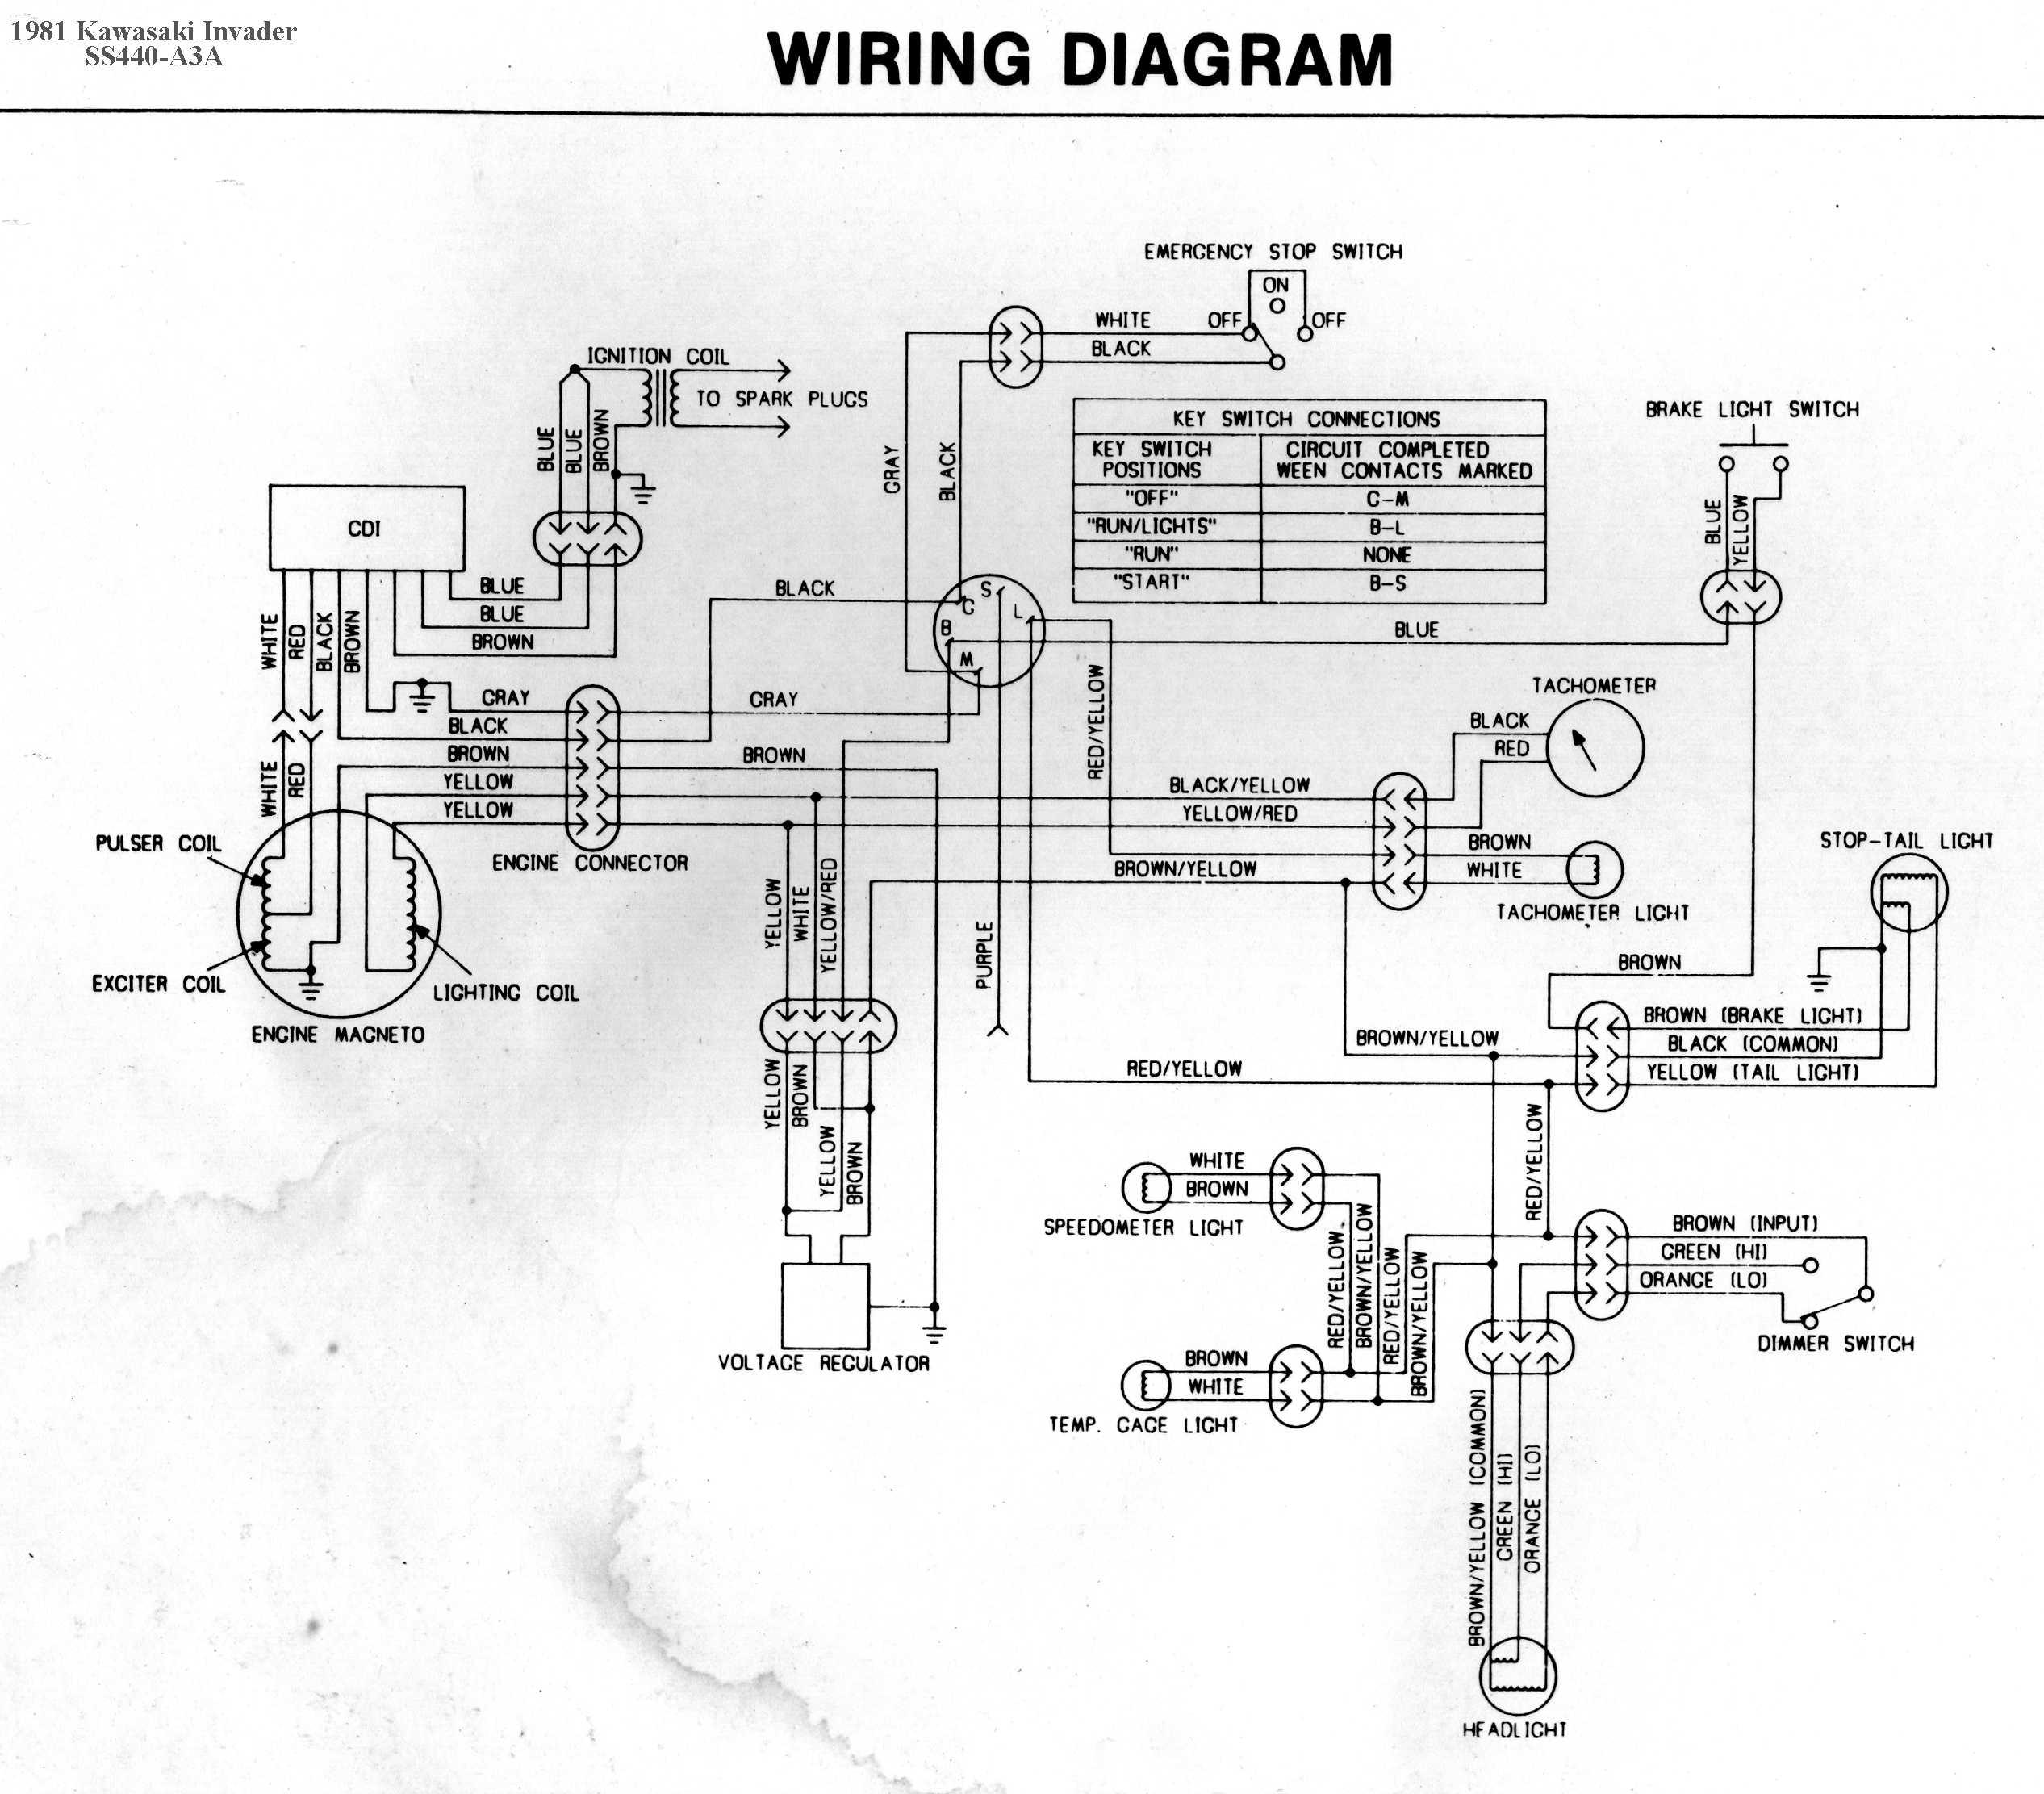 diagram] yamaha enticer wiring diagram full version hd quality wiring  diagram - wiringinstru.argiso.it  wiringinstru.argiso.it